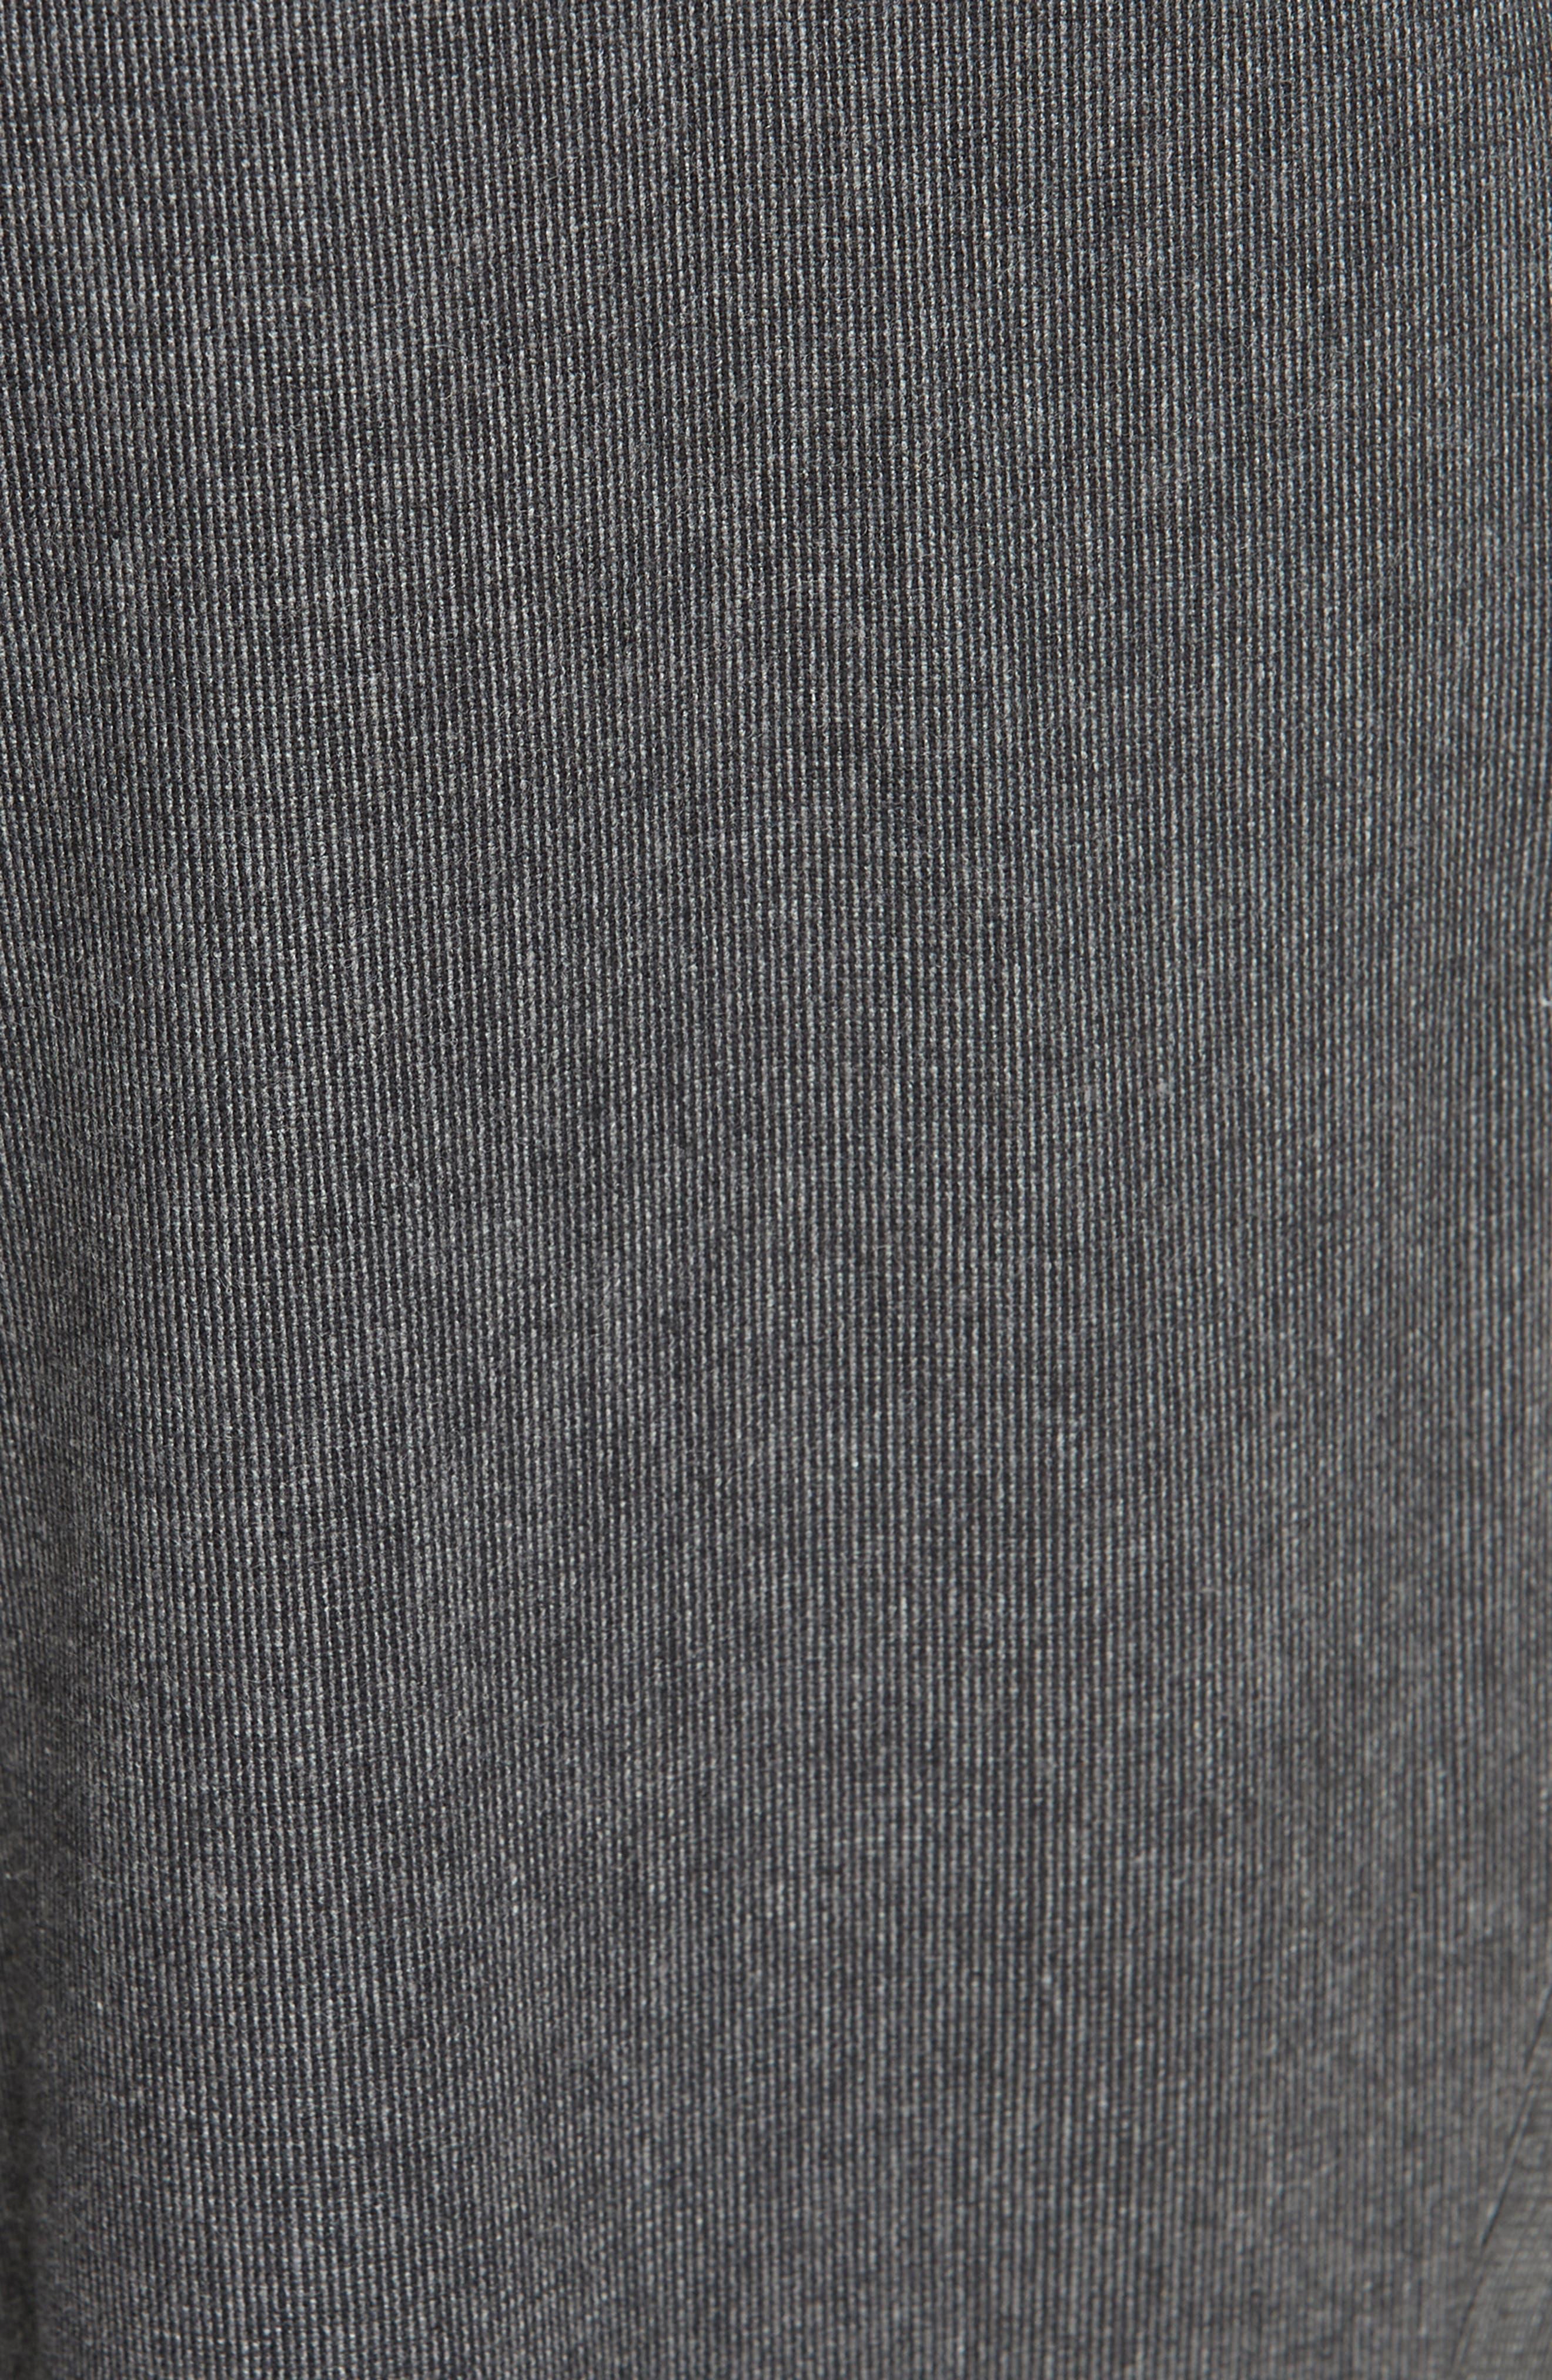 Trim Fit Sport Trousers,                             Alternate thumbnail 5, color,                             CHARCOAL